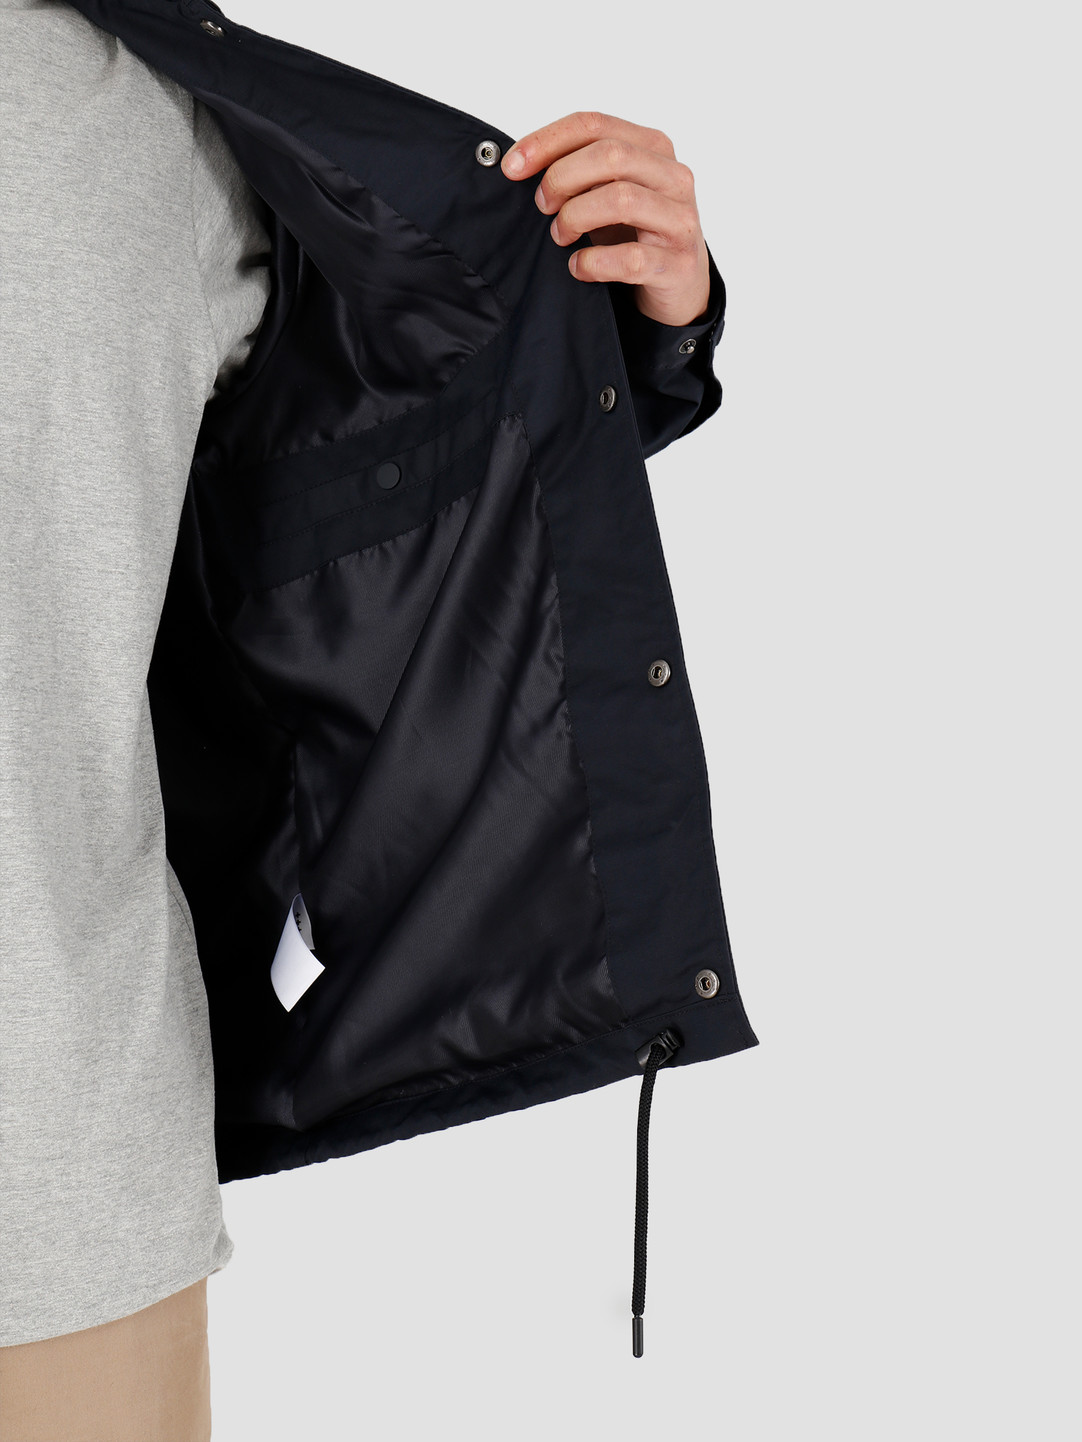 Quality Blanks Quality Blanks QB28 Coach Jacket Navy